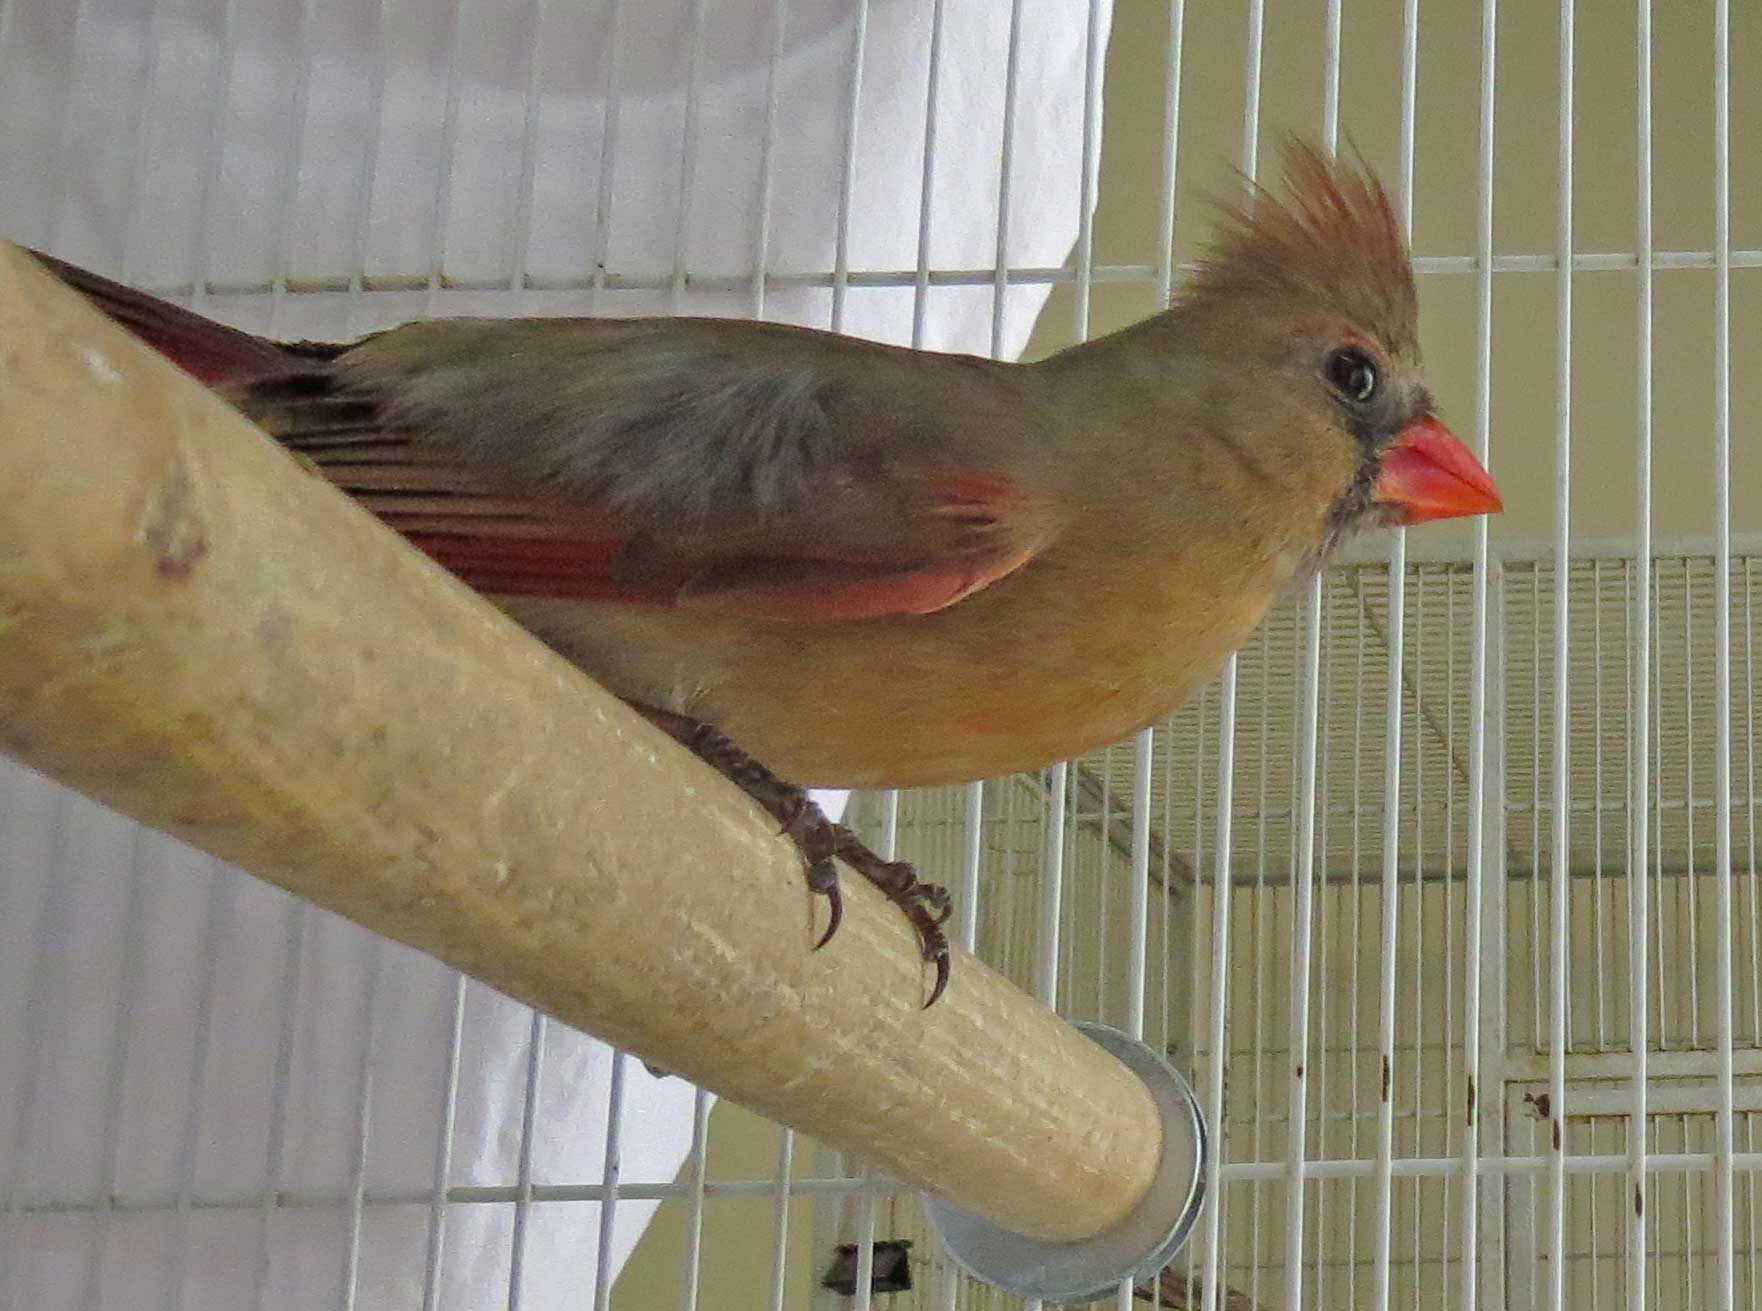 Wild Bird Rehabilitation